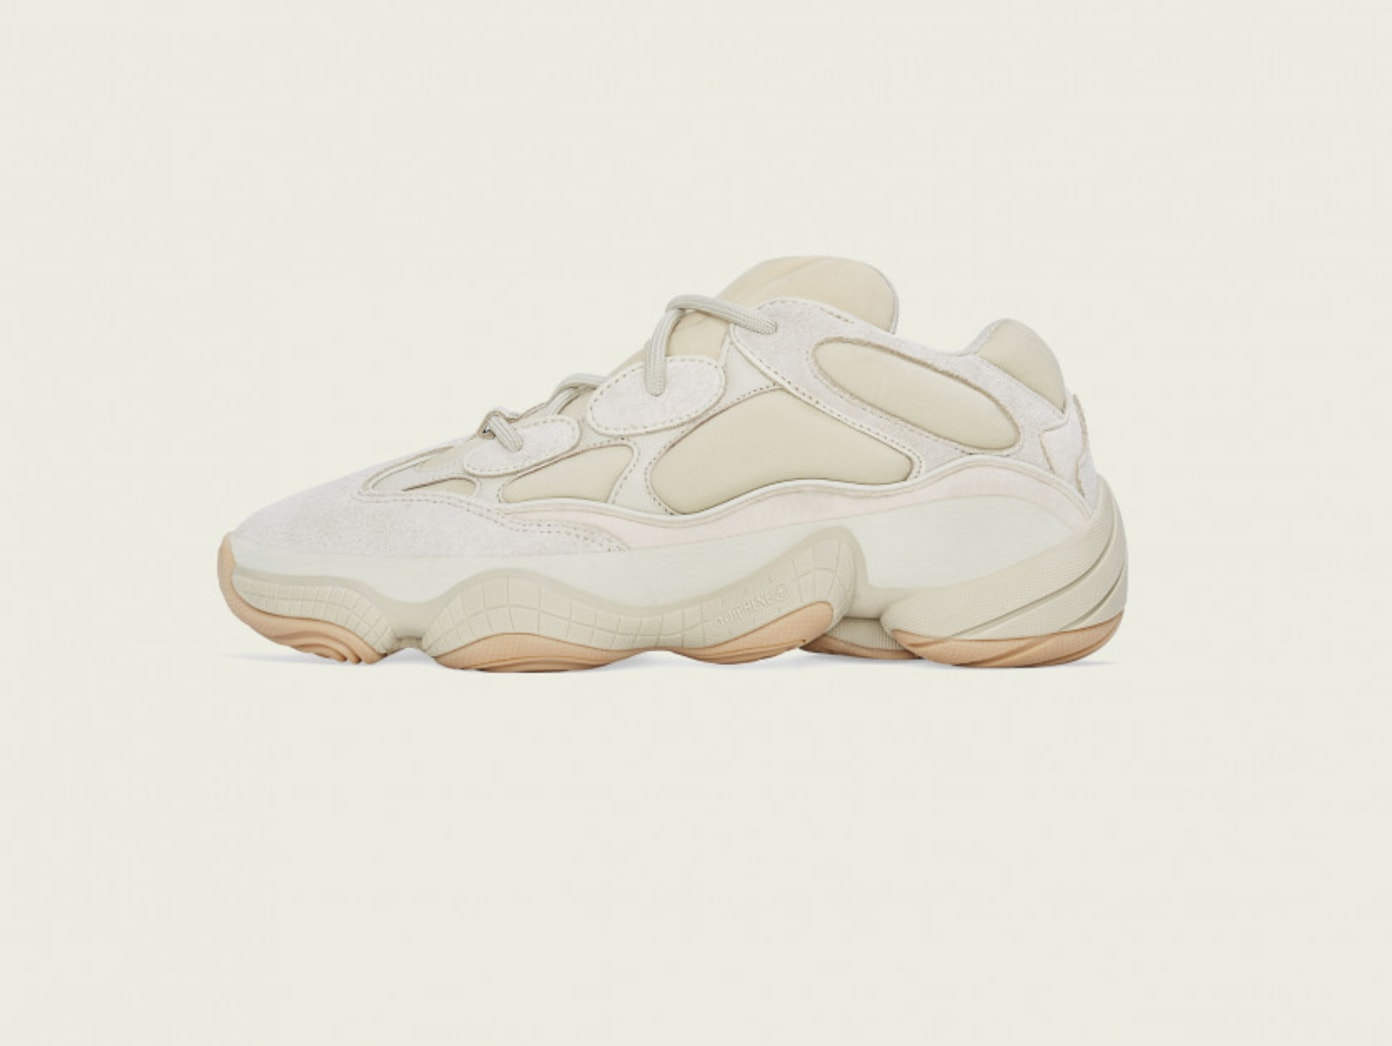 adidas Yeezy 500 'Stone'